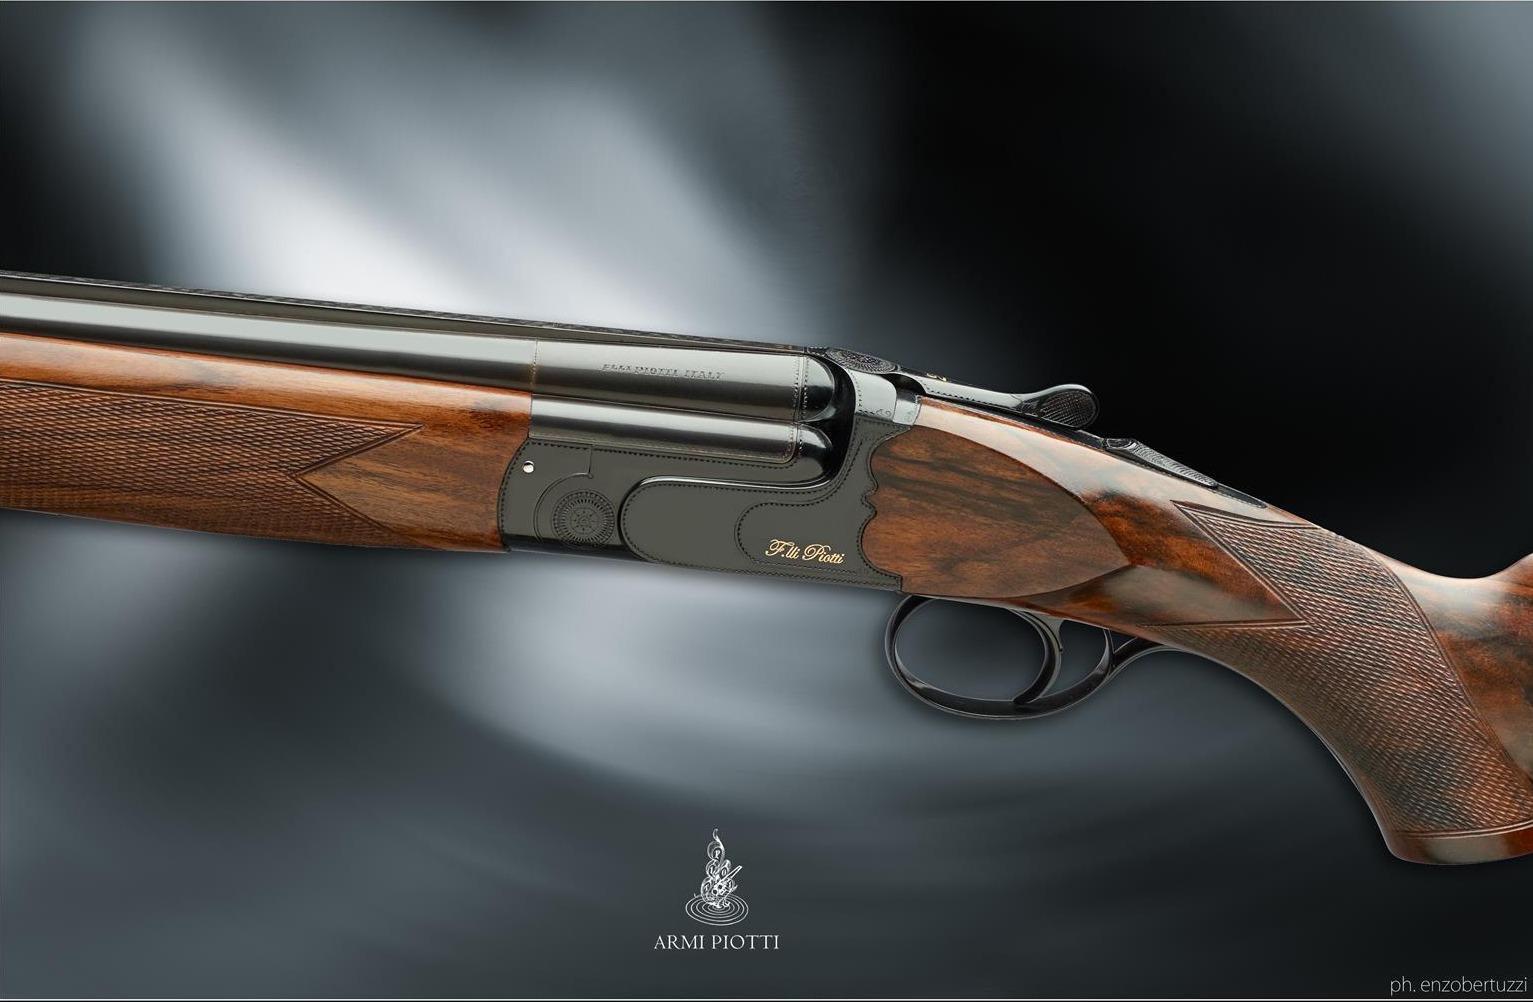 Piotti sporting shotgun